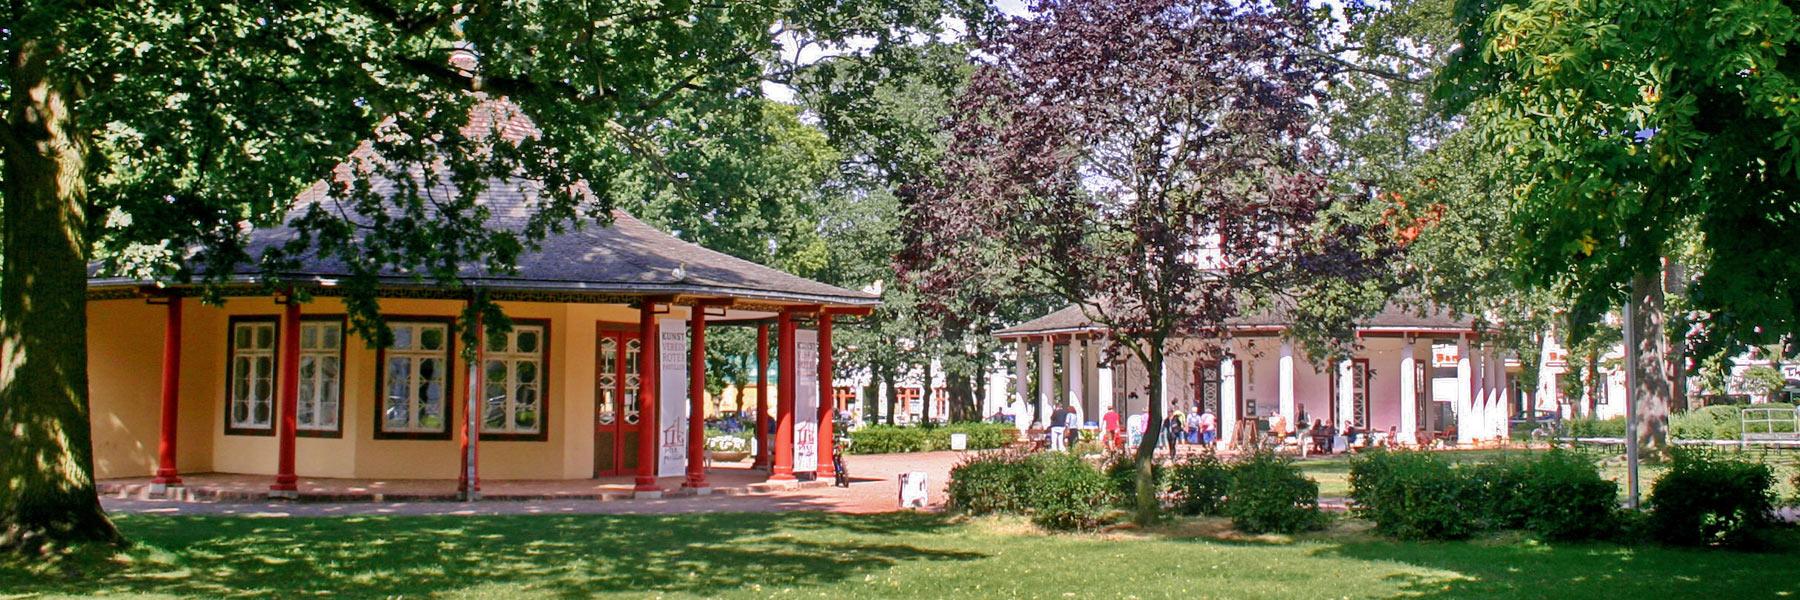 Pavillon - Bad Doberan